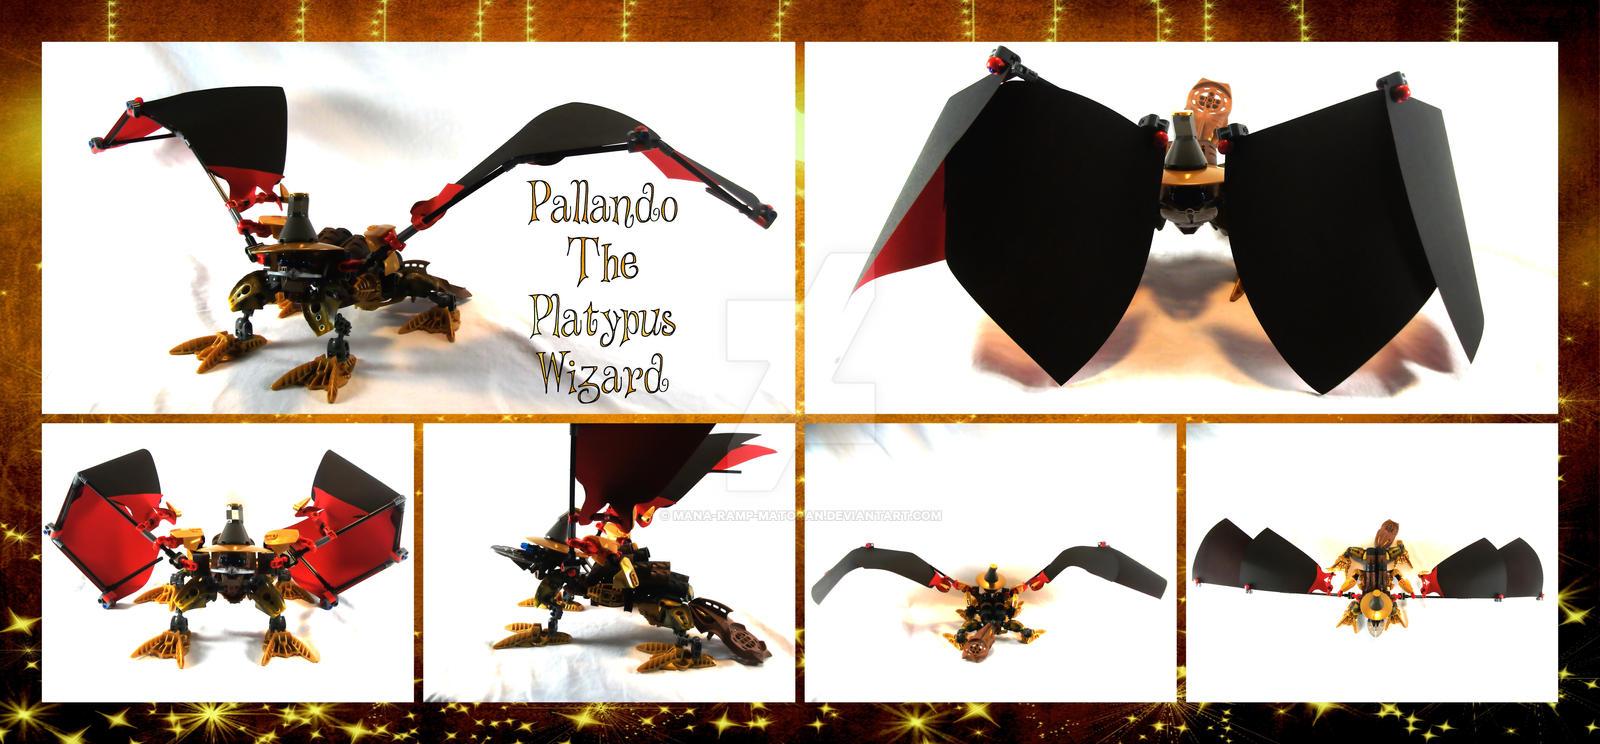 Bionicle MOC: Pallando The Platypus Wizard by 3rdeye88